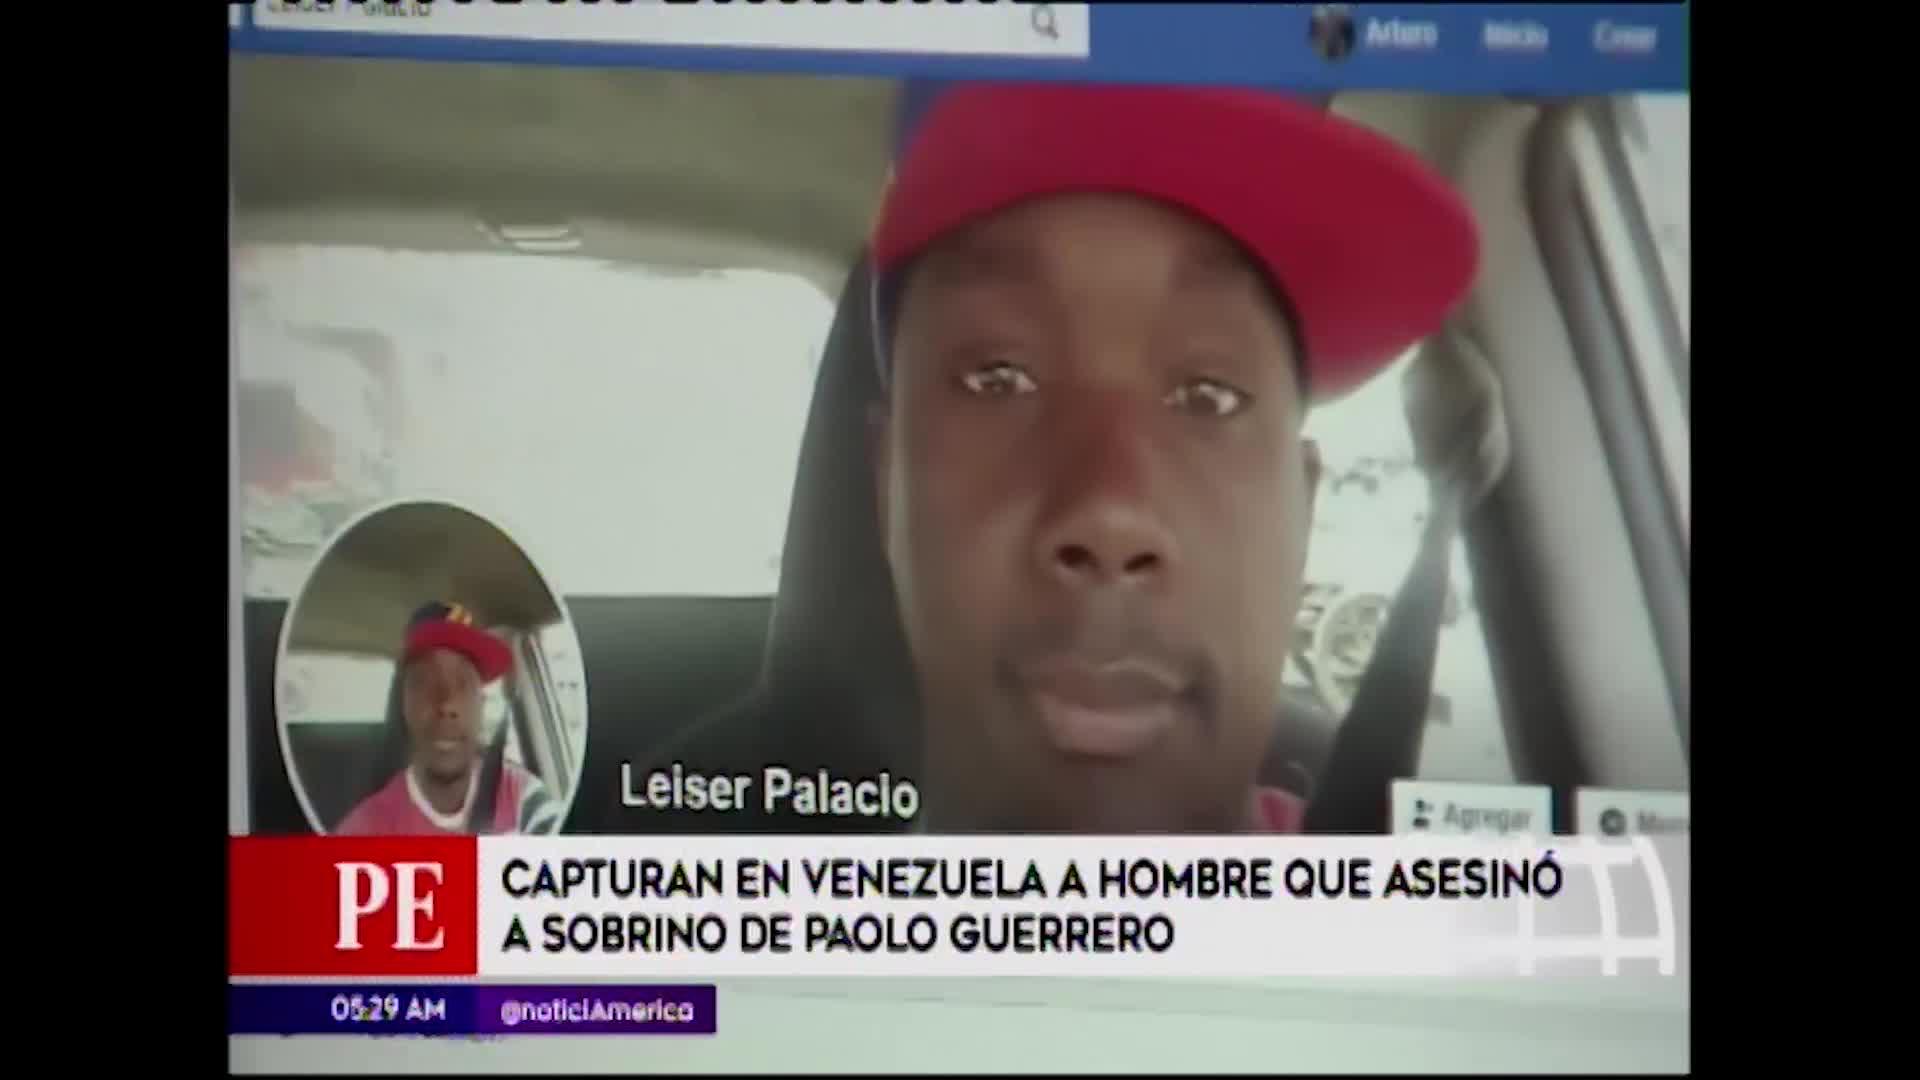 Venezuela: es capturado sujeto que atropelló a sobrino de Paolo Guerrero